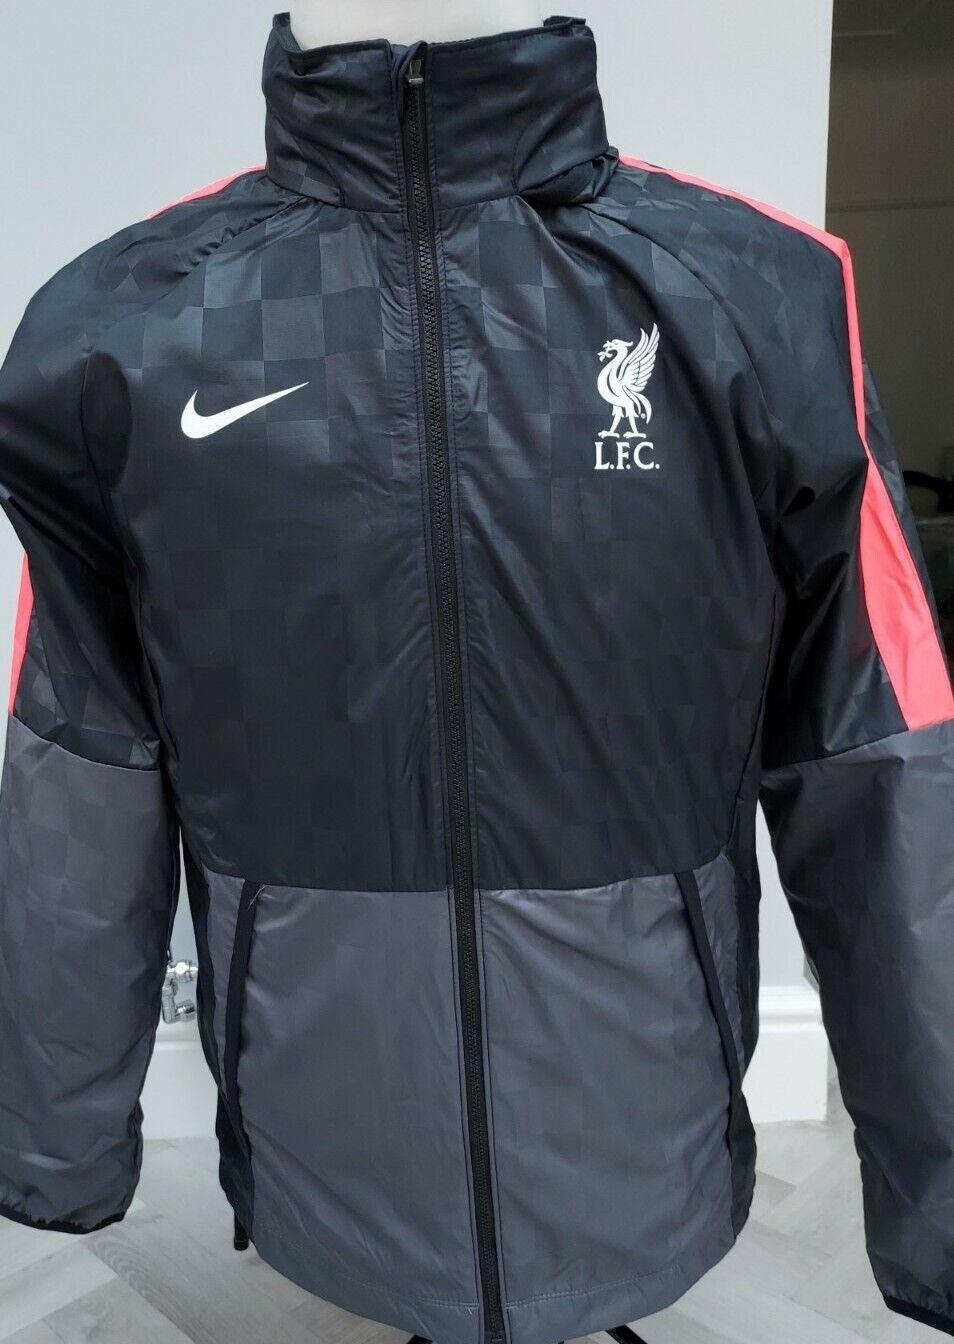 GENUINE Liverpool FC NIKE training JACKET / COAT RRP BNWT / SUPERB MED